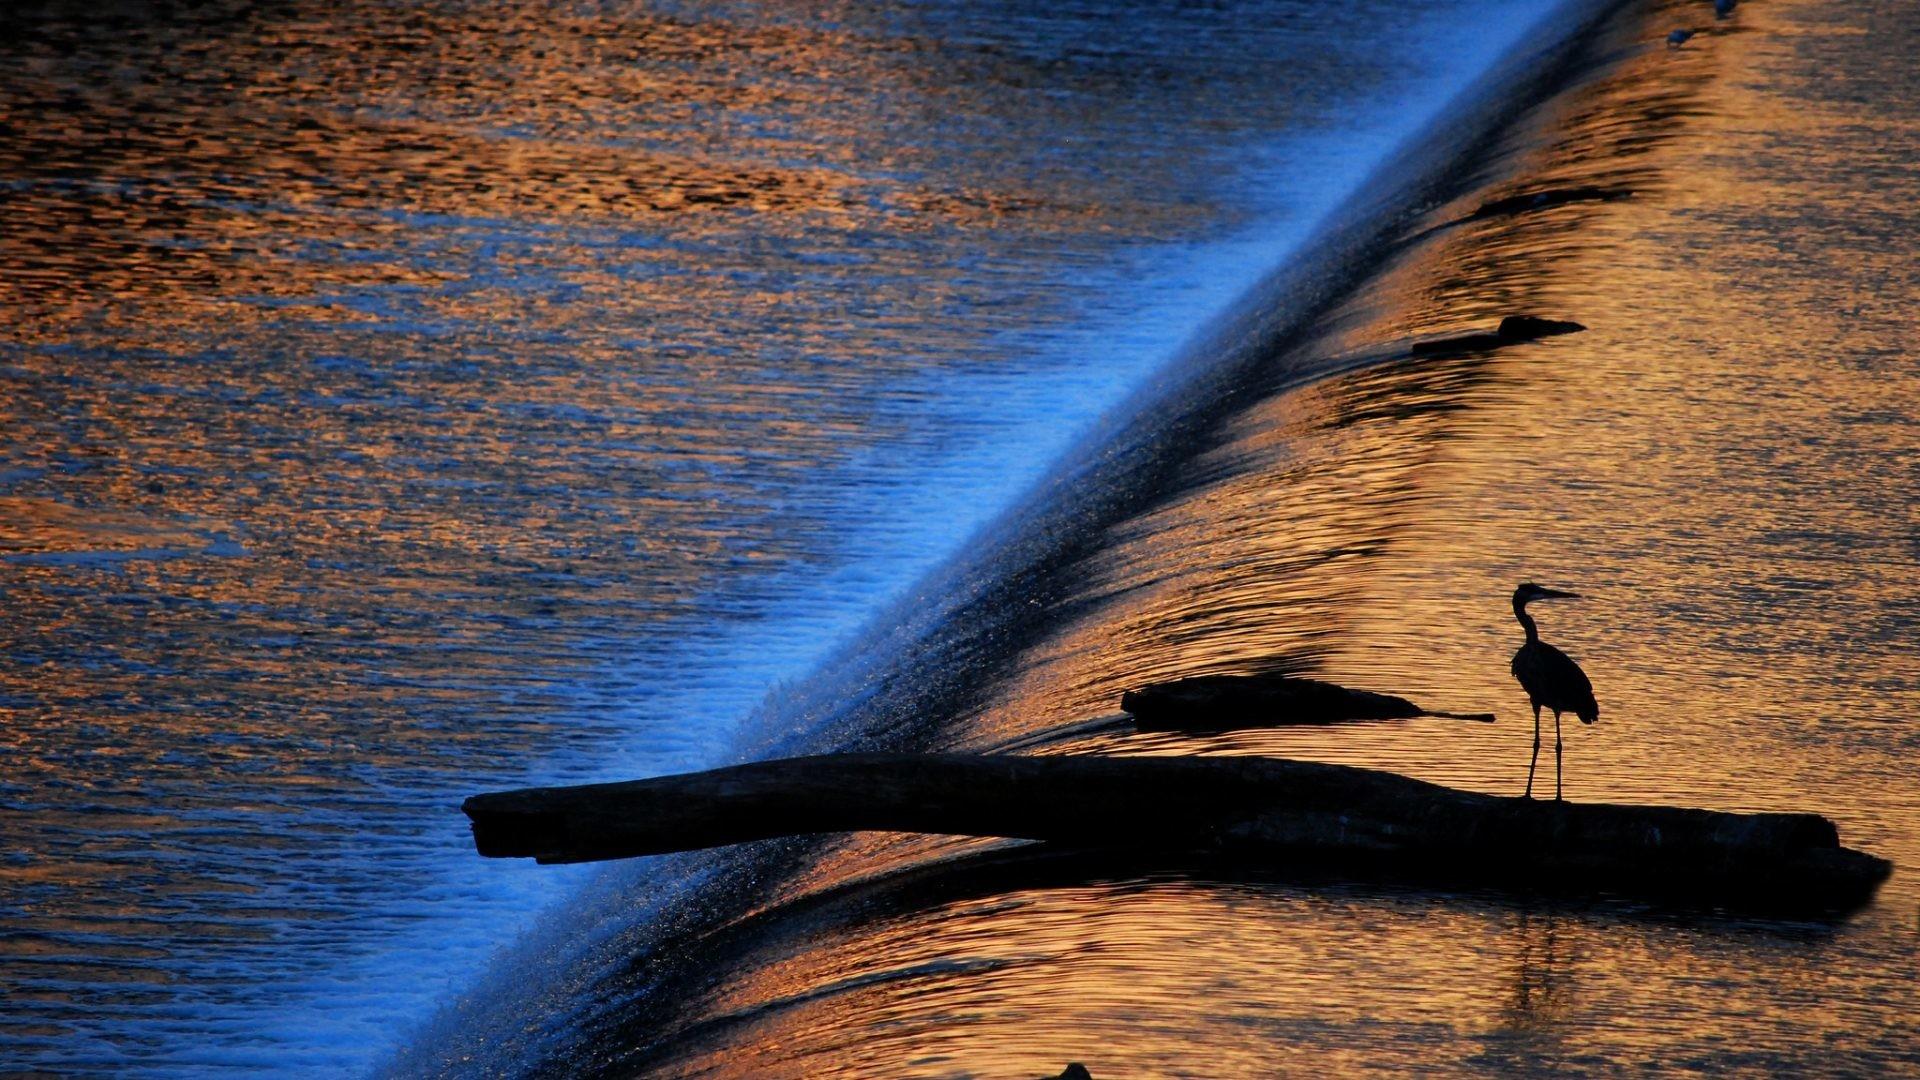 Res: 1920x1080, Stream Reflection Bird Heron Mood Sun Game Water Waterfall Silhouette Light  Wallpaper Image